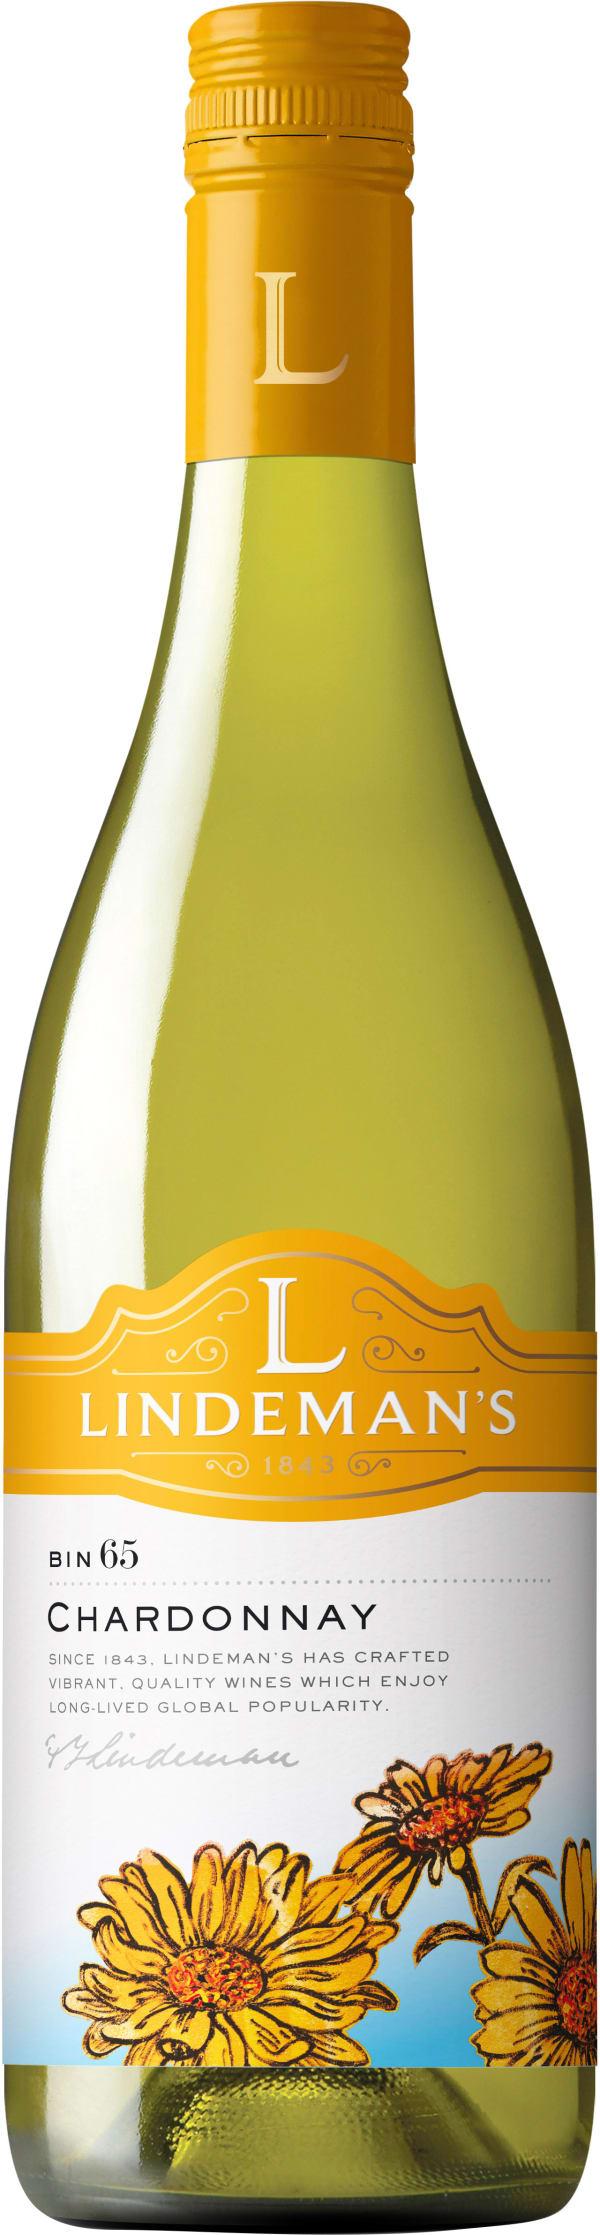 Lindemans Bin 65 Chardonnay 2019